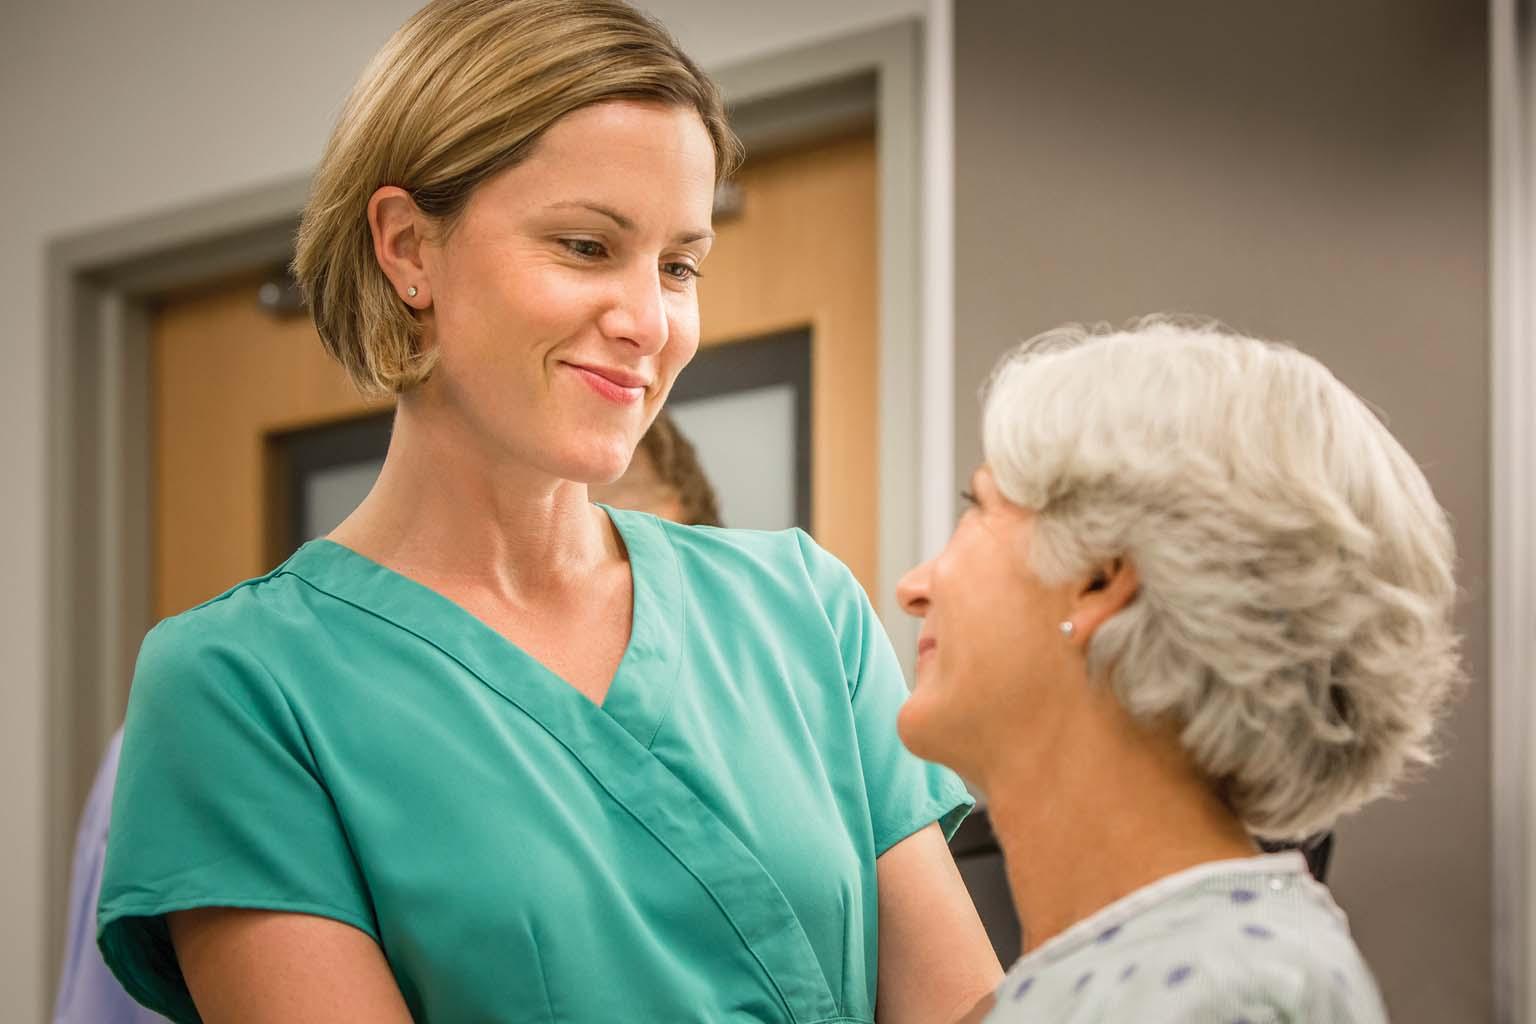 nurse comforting female patient in hospital